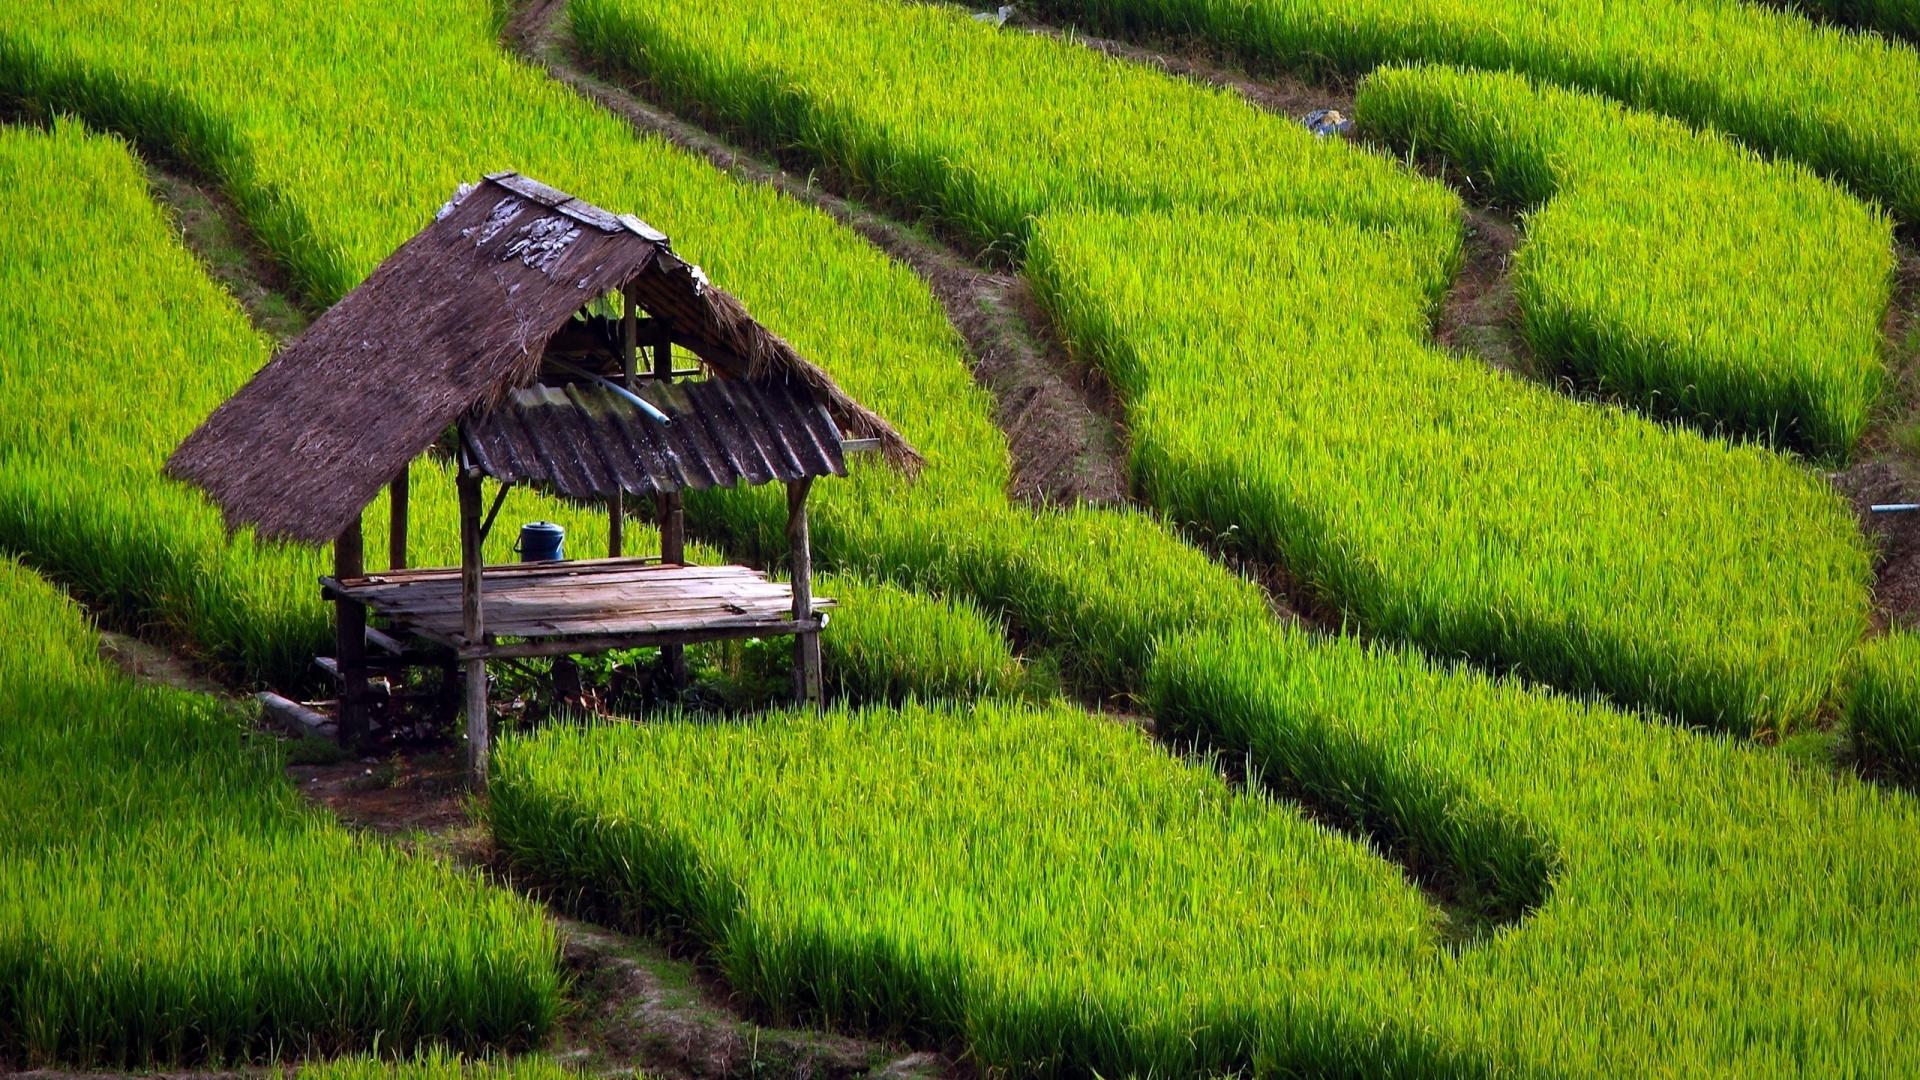 6961034-rice-field-wallpaper